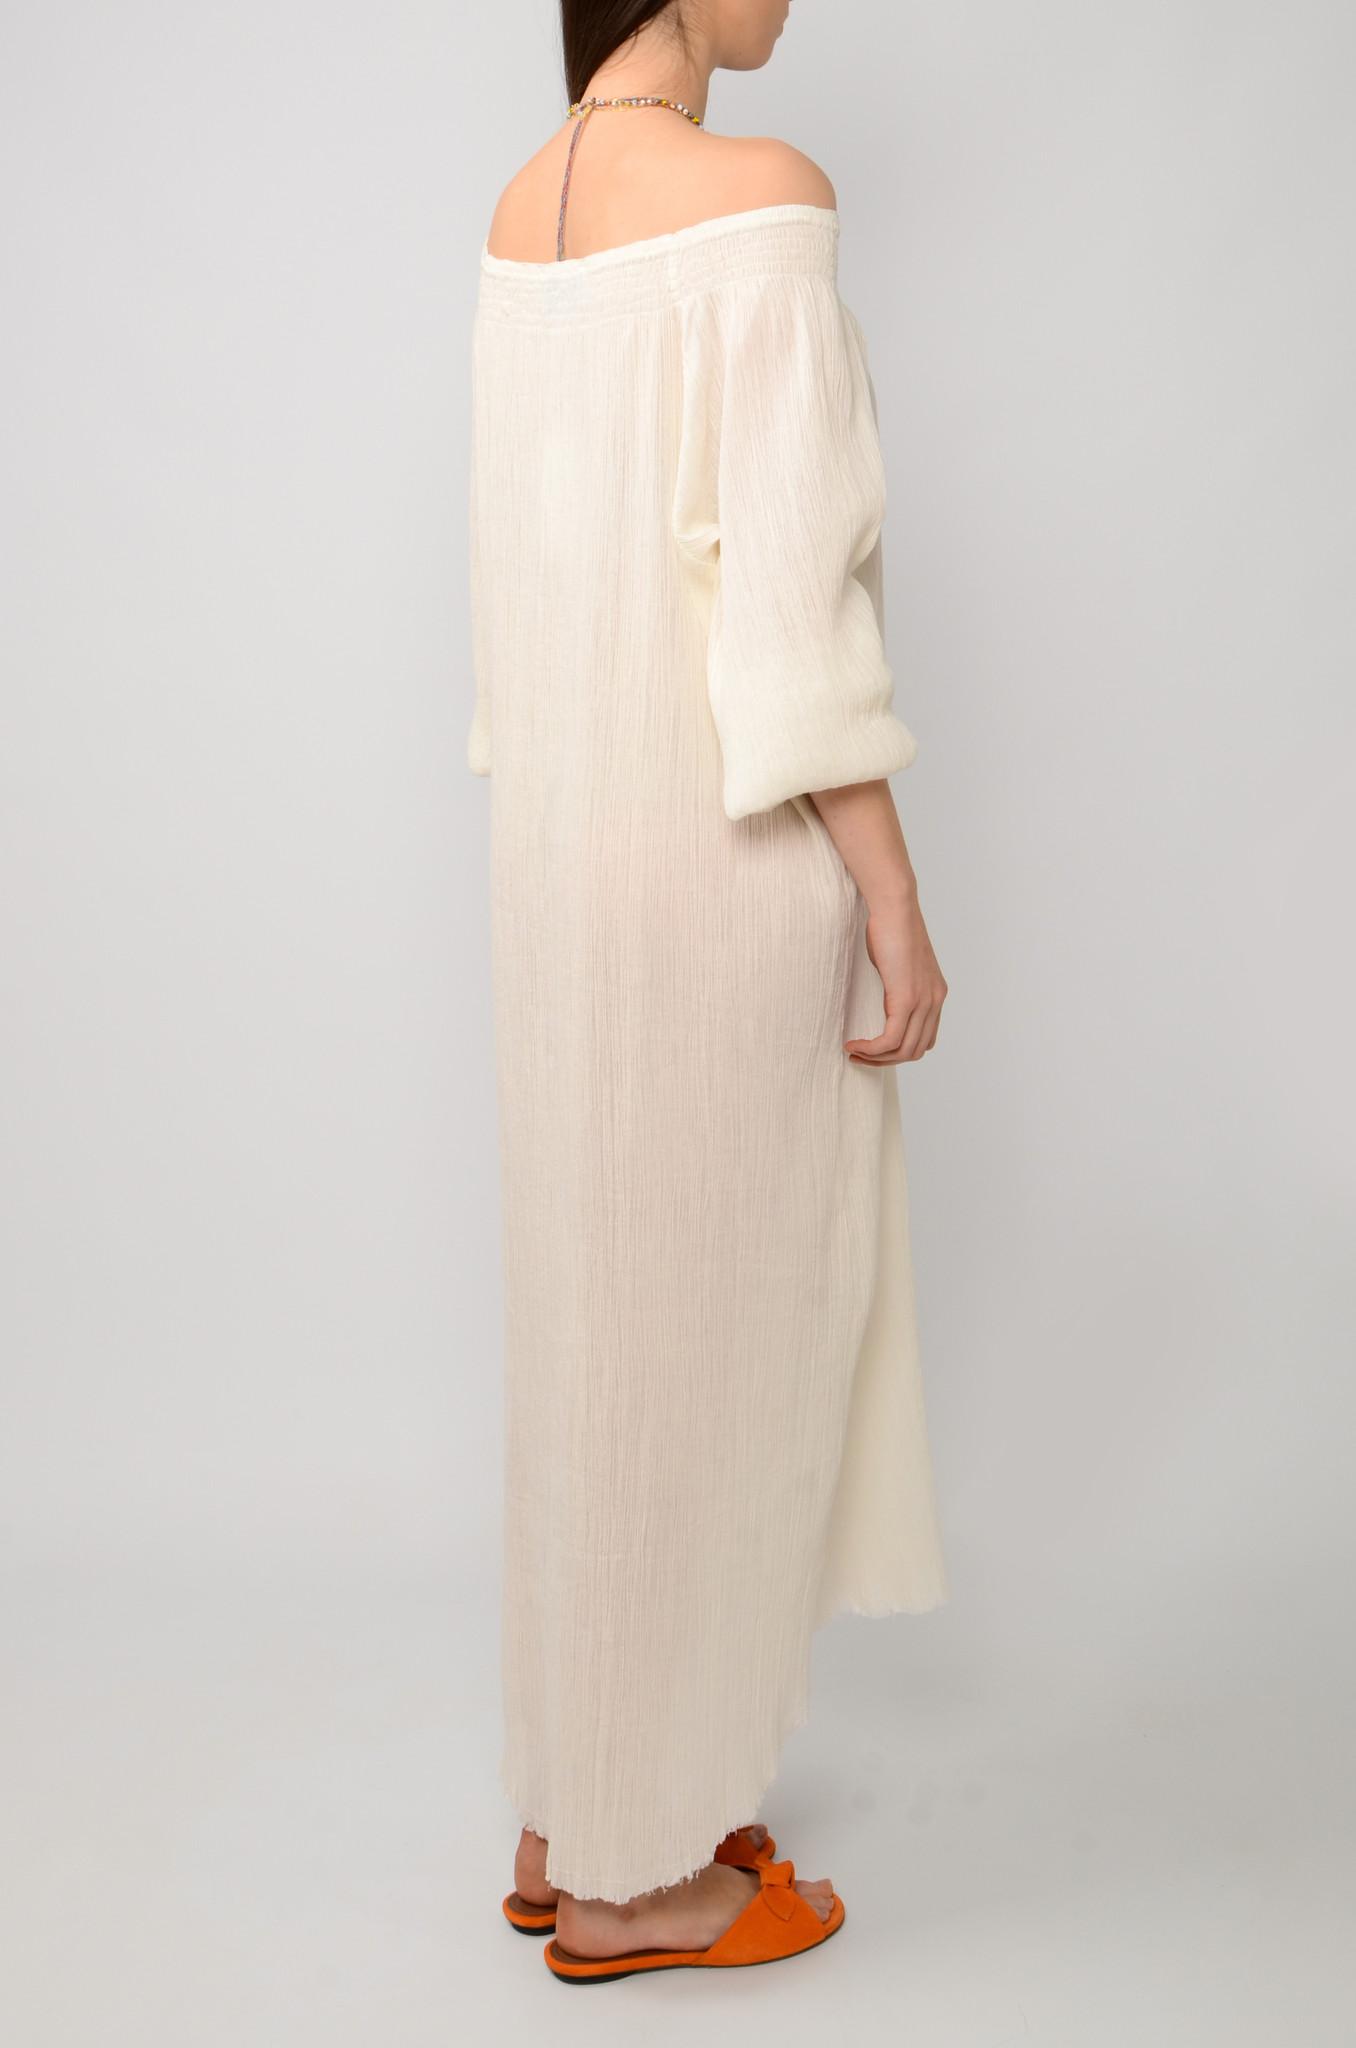 MERCEDES DRESS-4